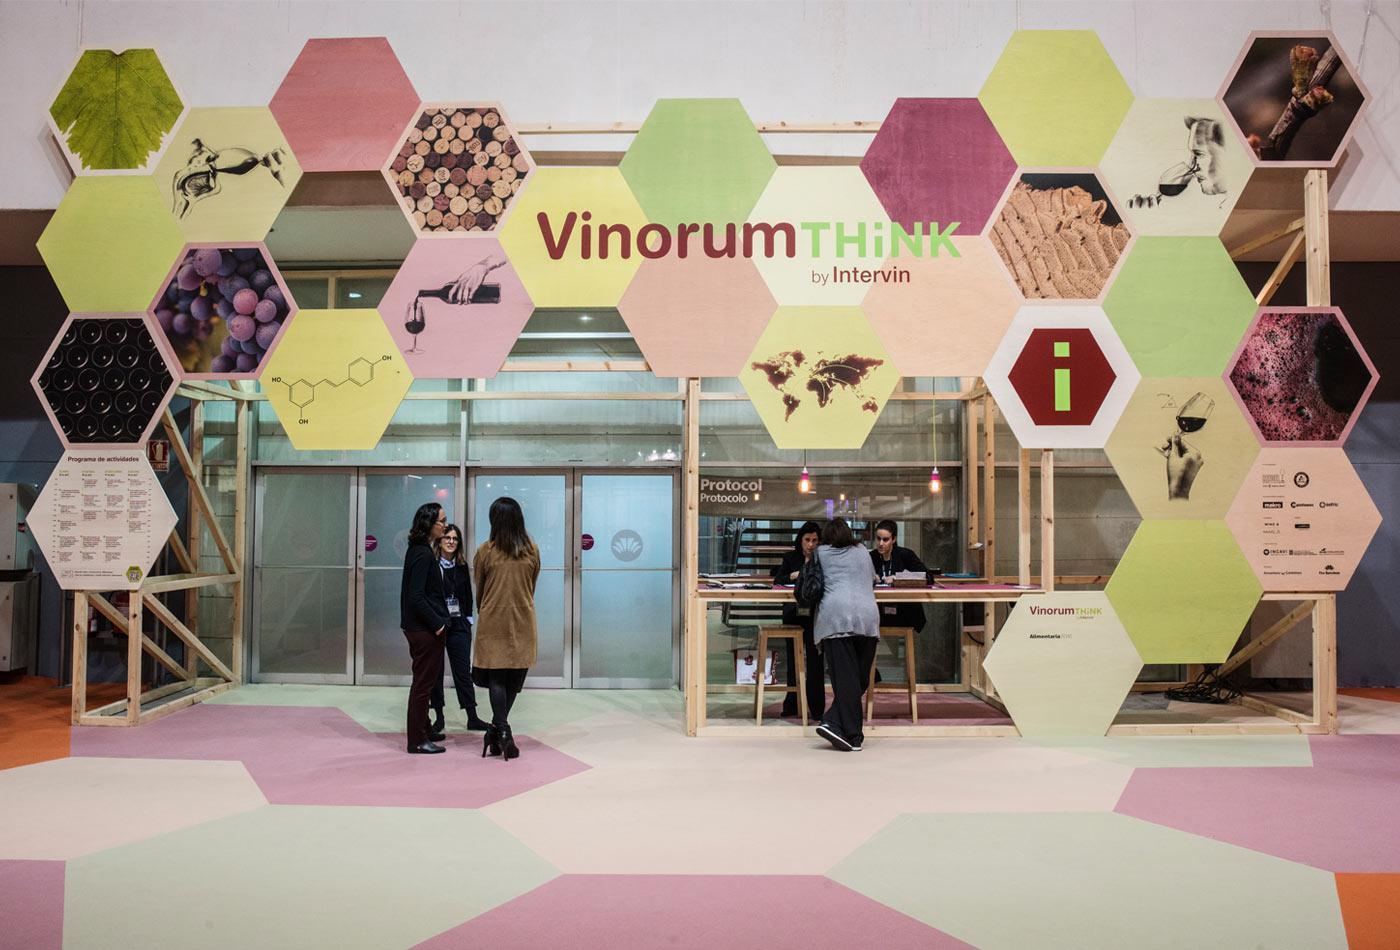 espai-vinorum-think-itervin-alimentaria-creartiva